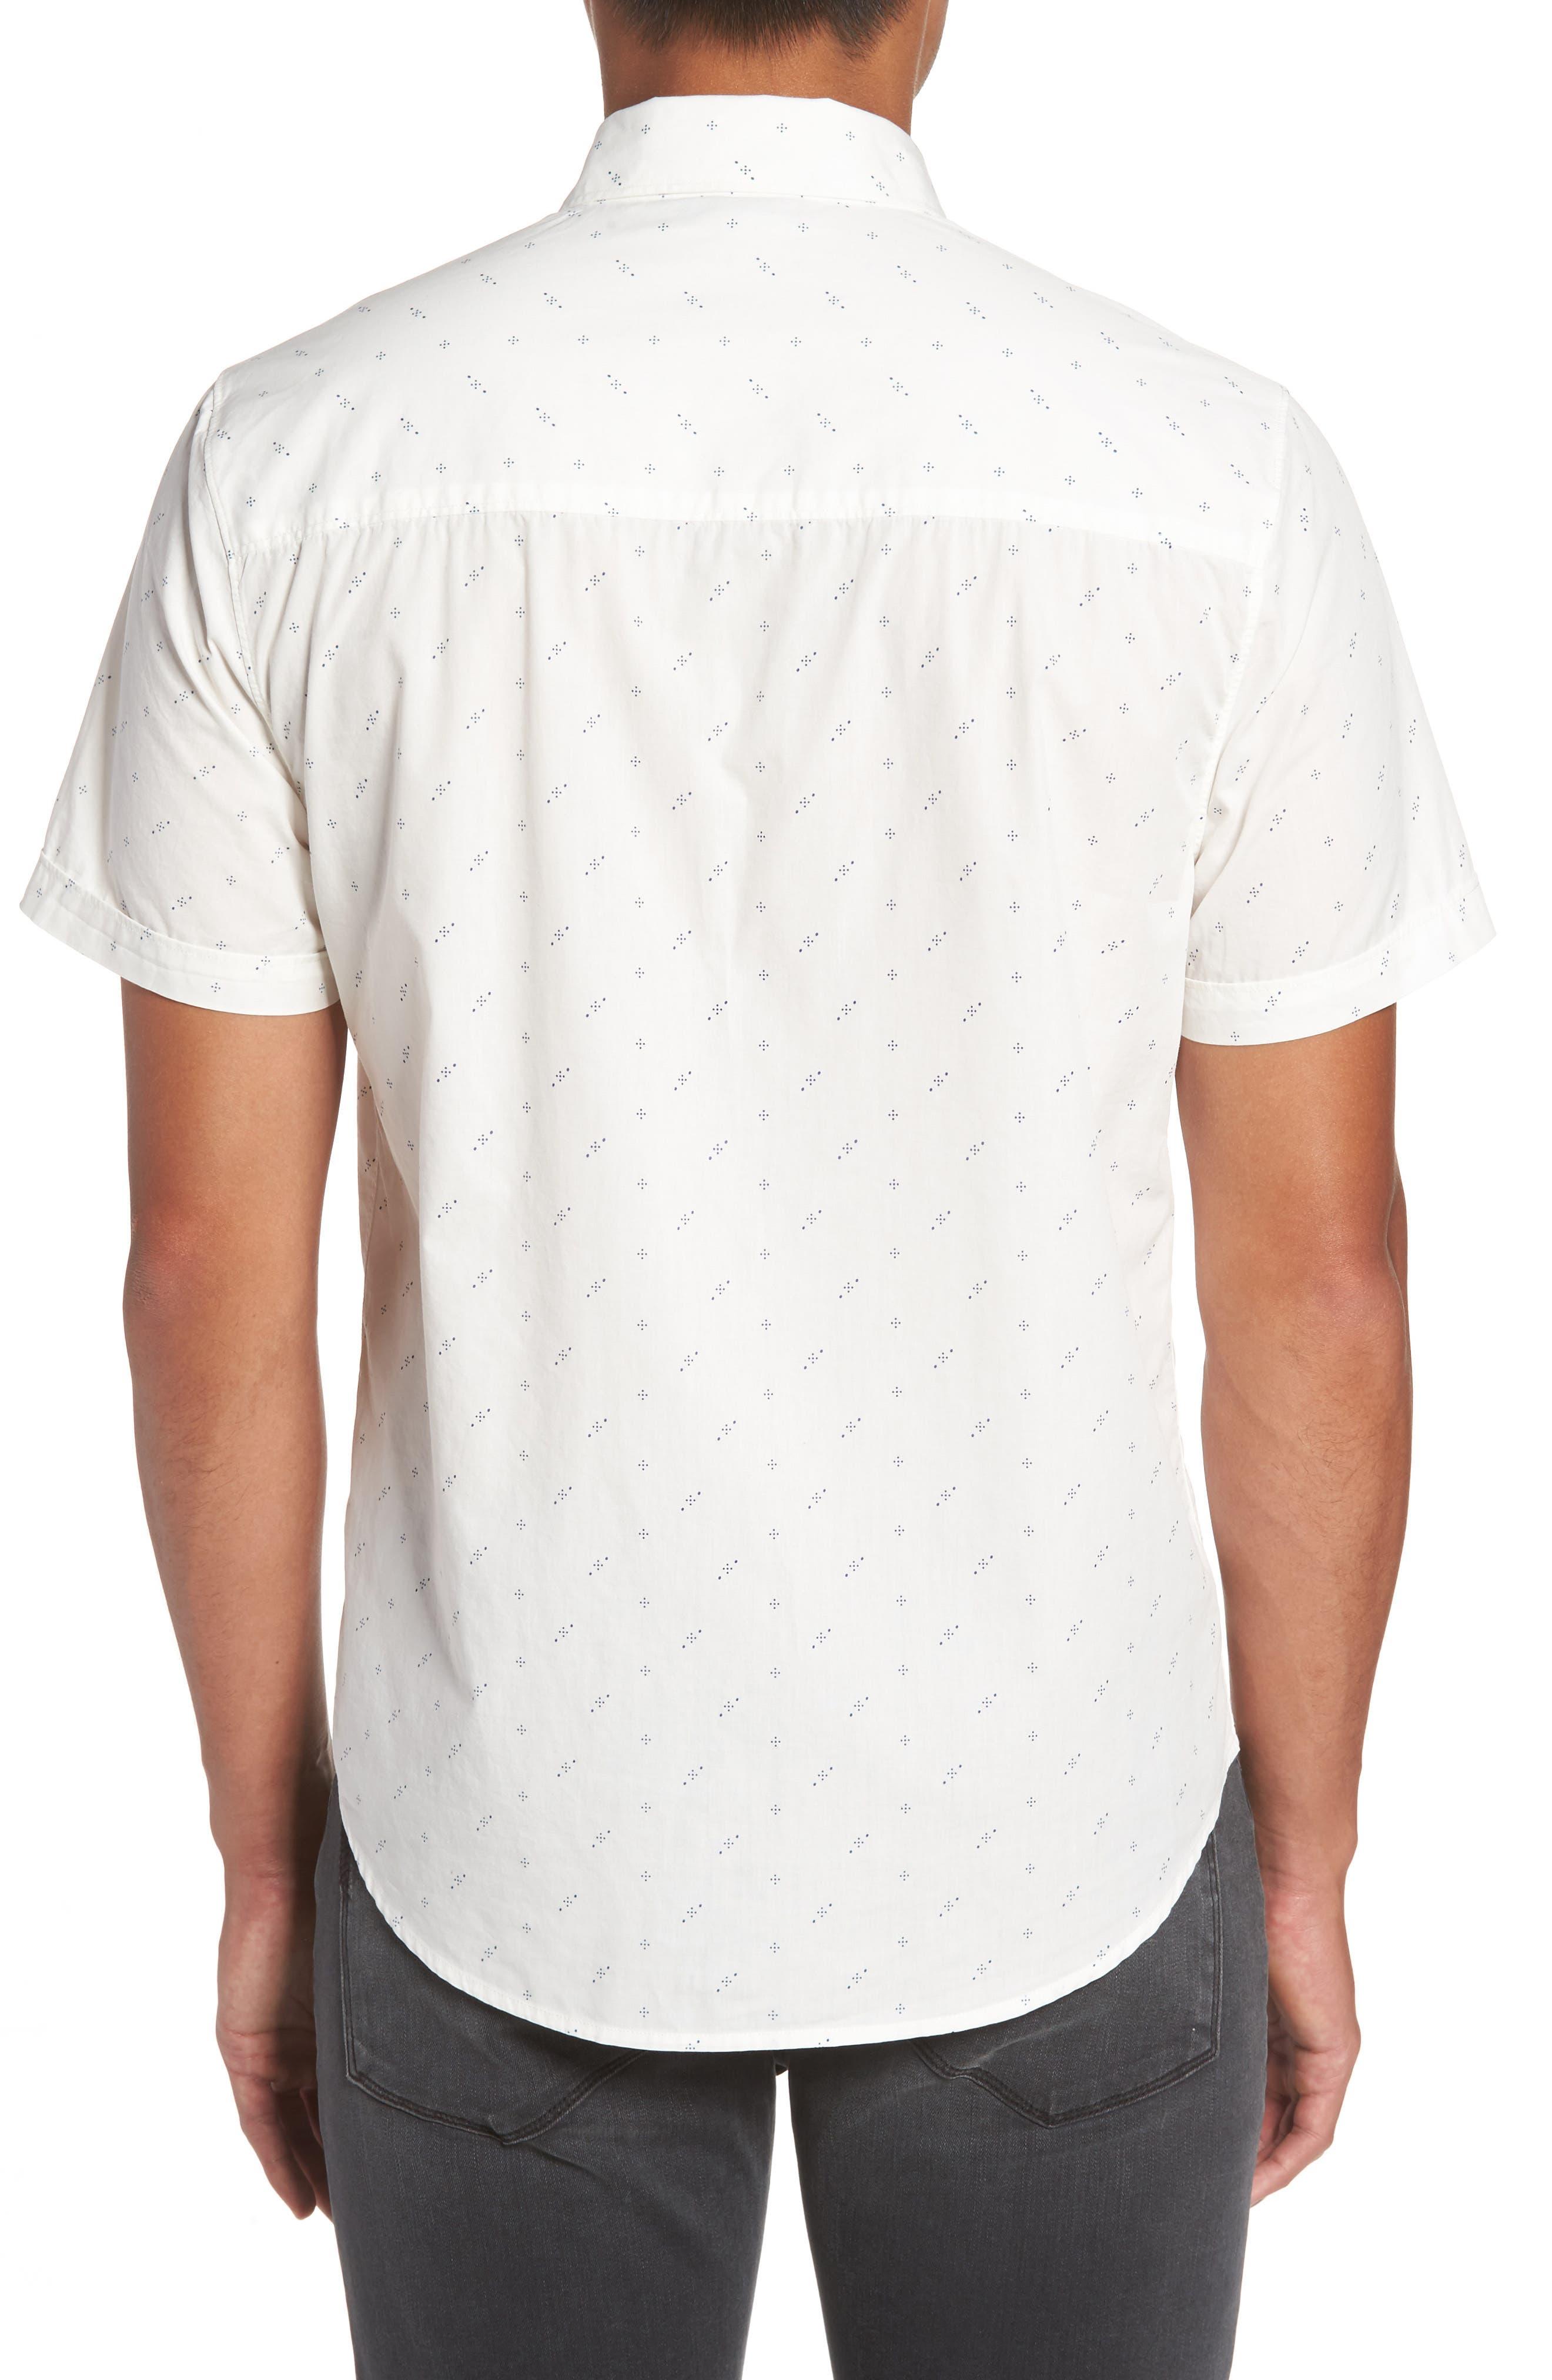 Becker Dot Print Woven Shirt,                             Alternate thumbnail 2, color,                             140